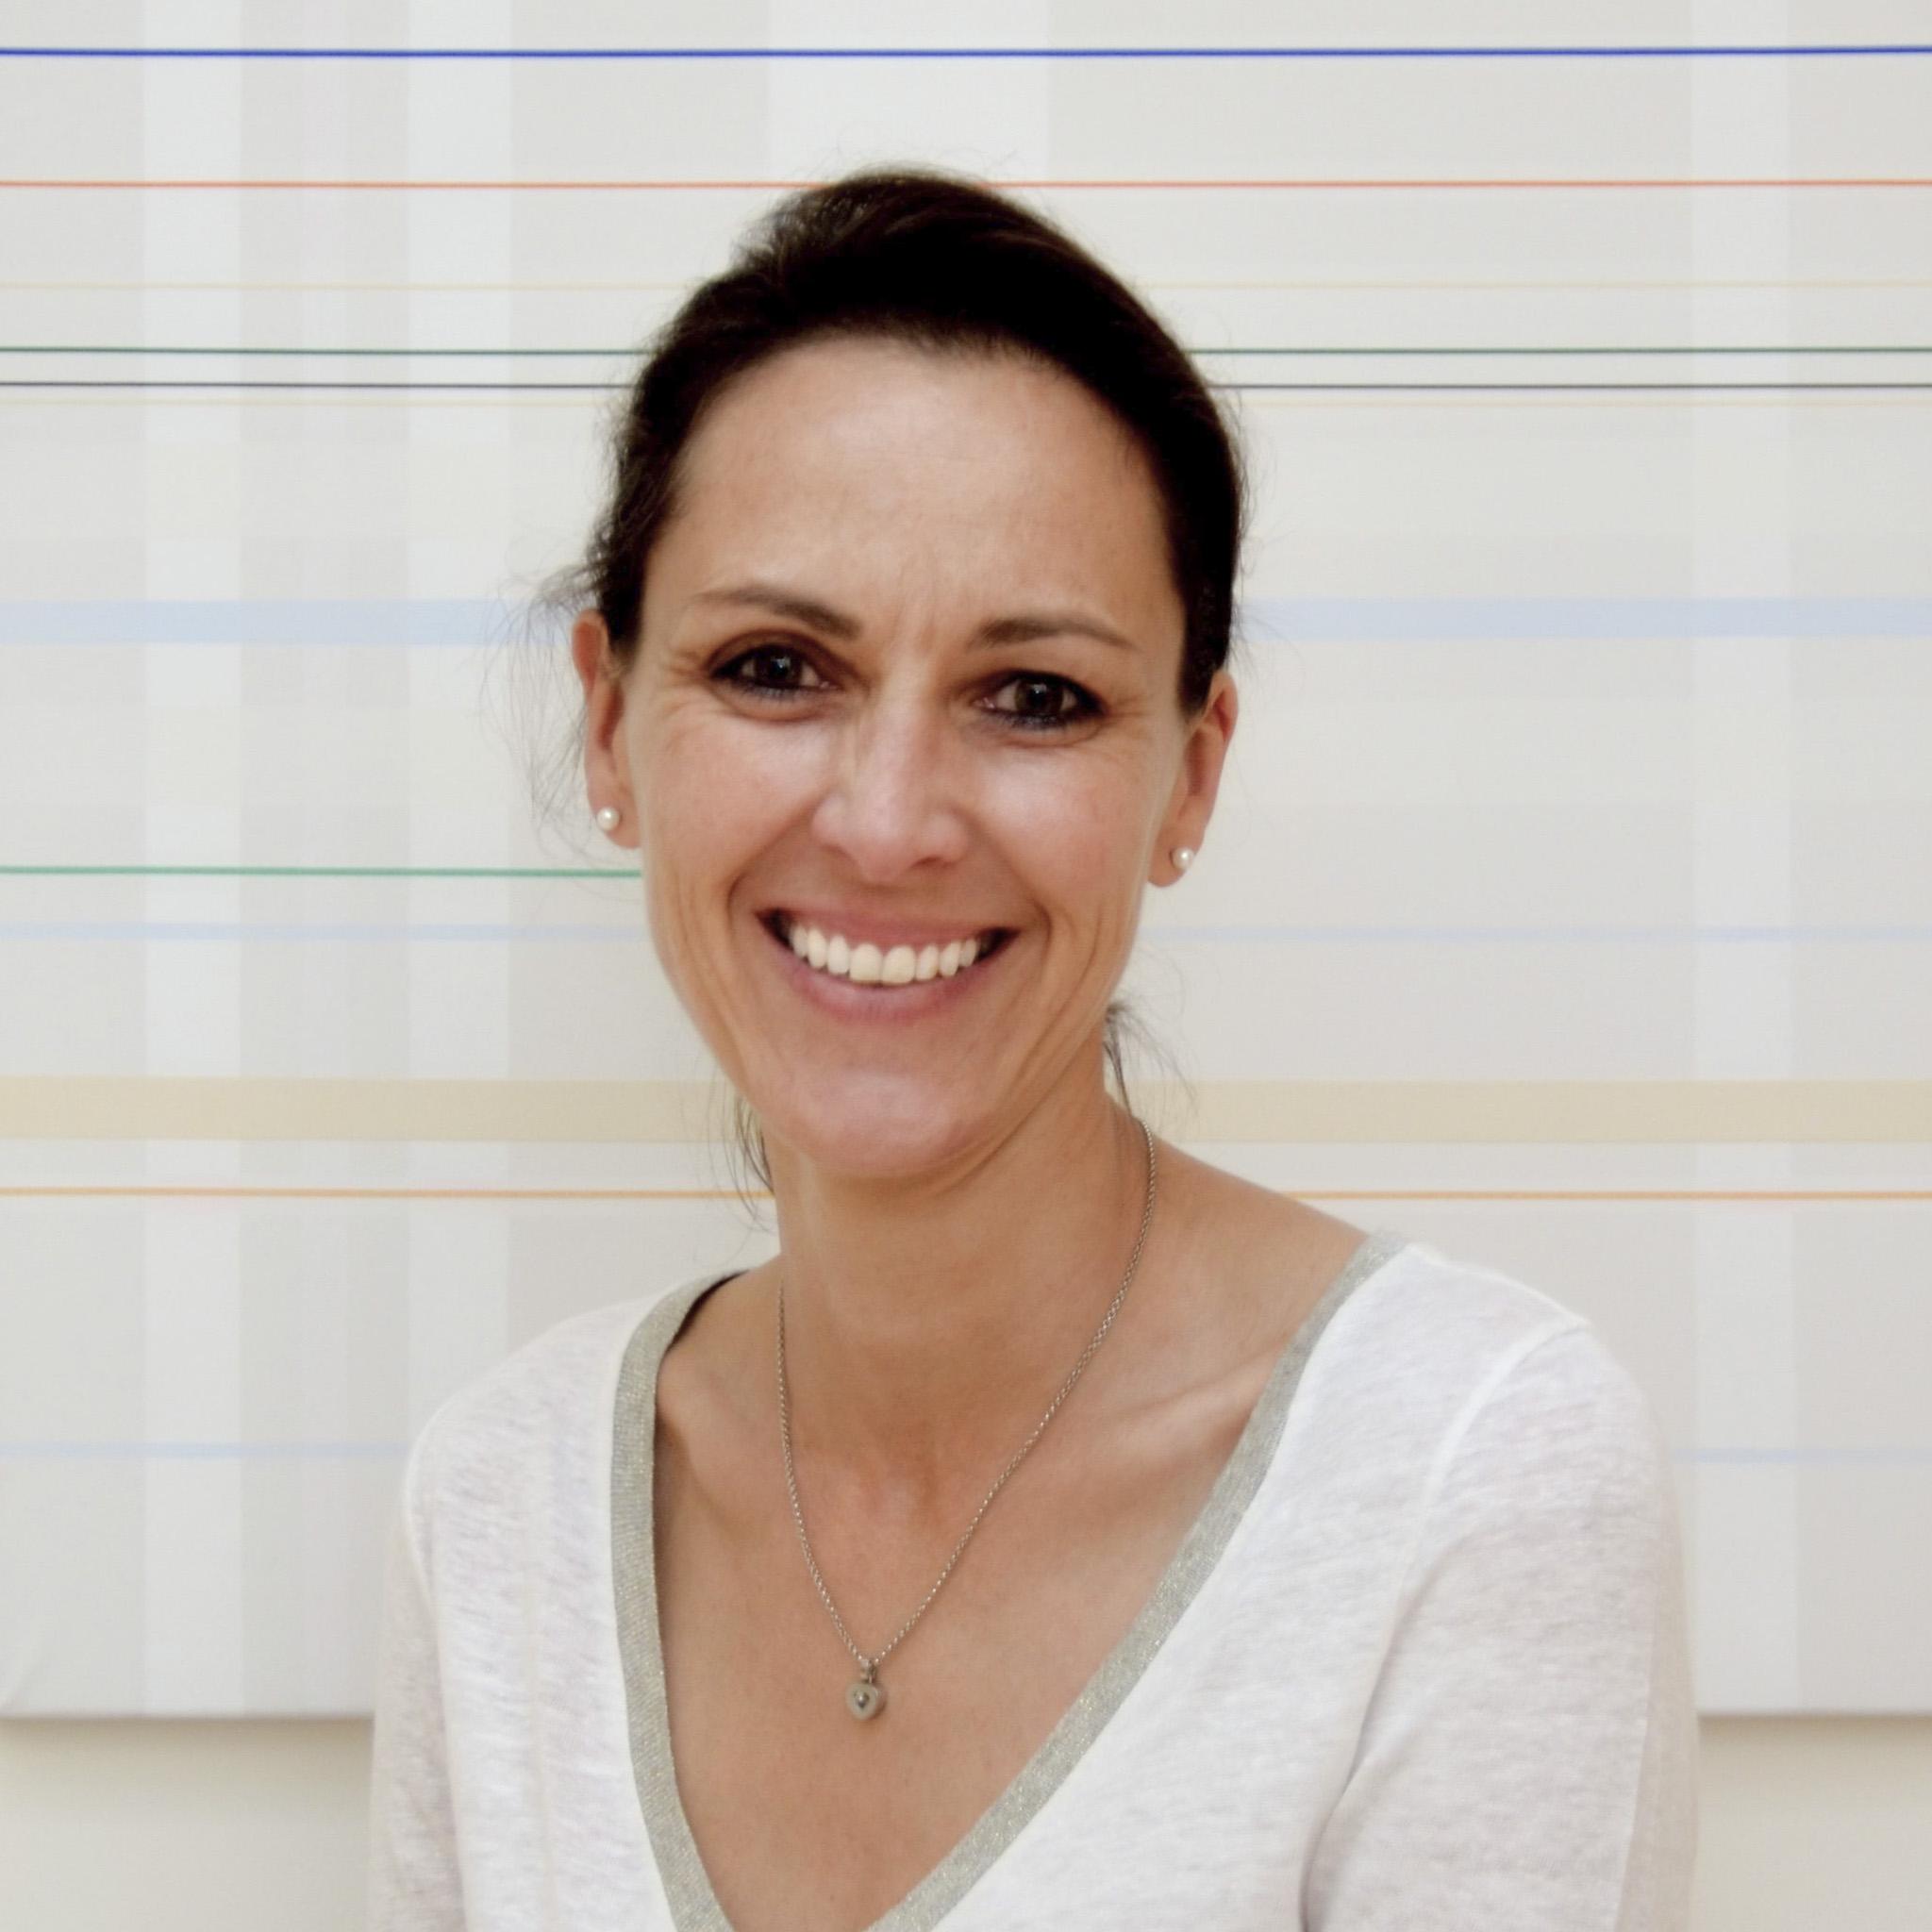 Anja Meier-Eberle